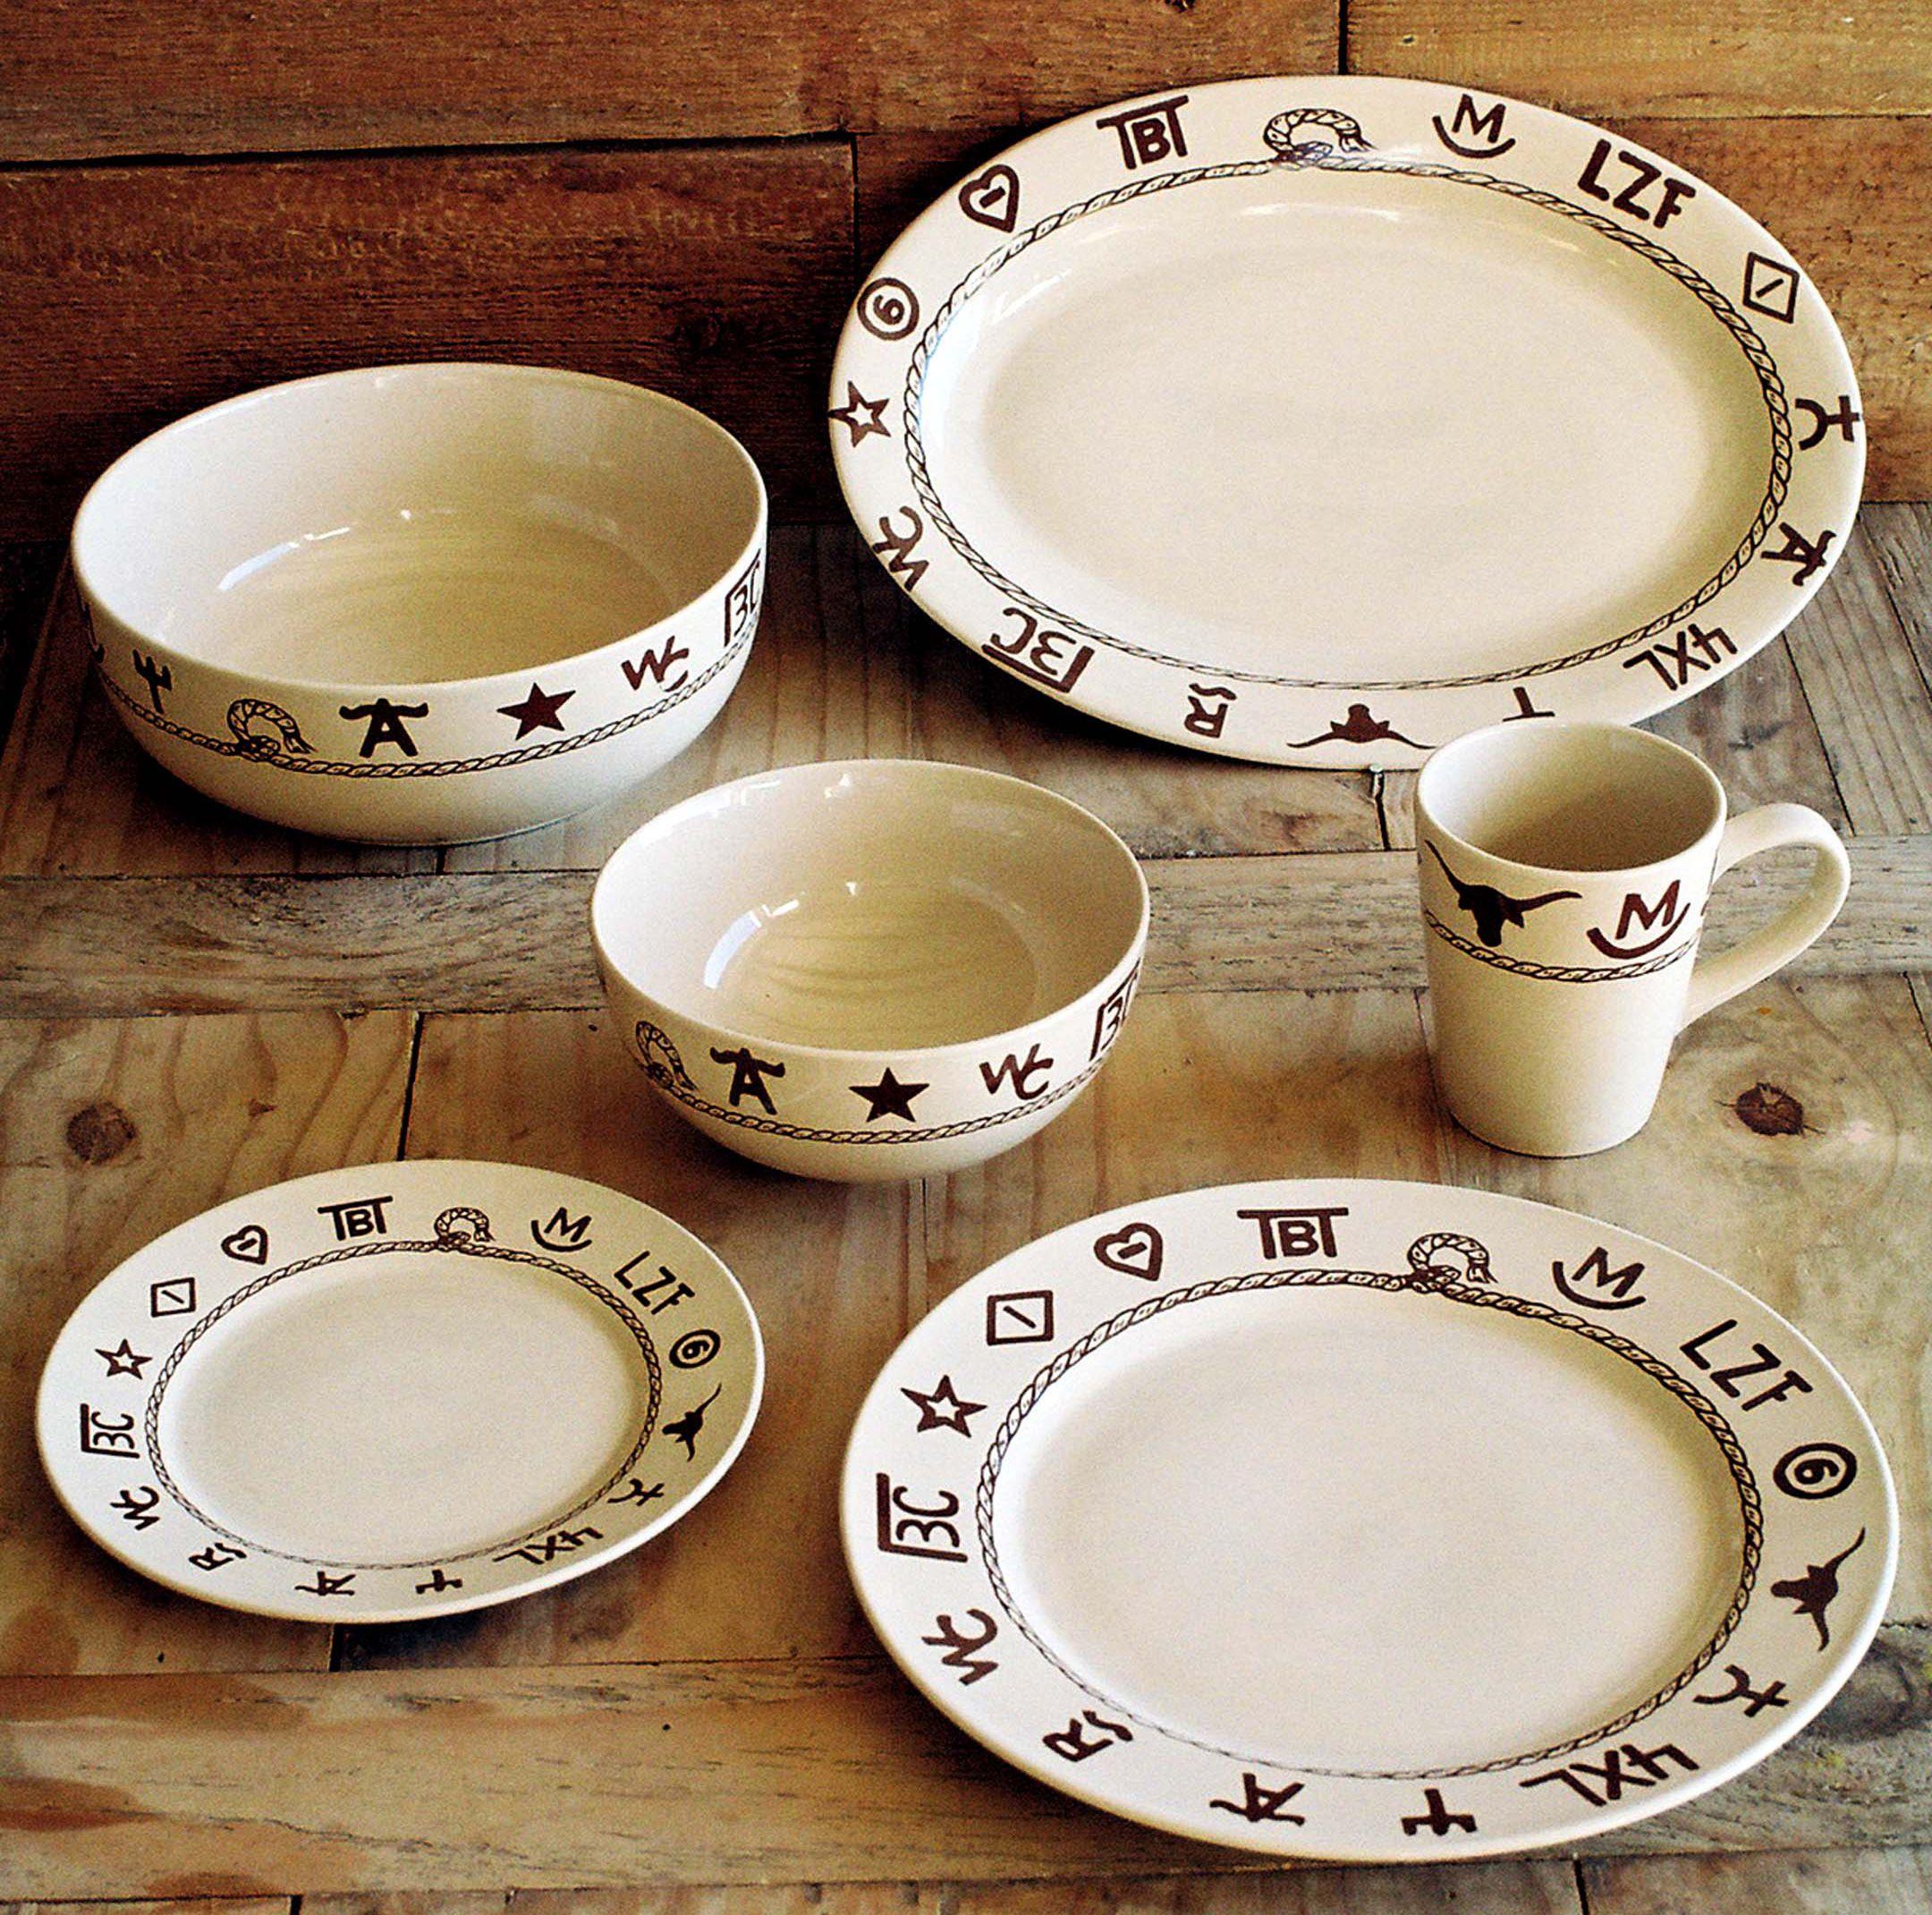 Western Dinnerware Dishware Goblets Branded Dinnerware Dining